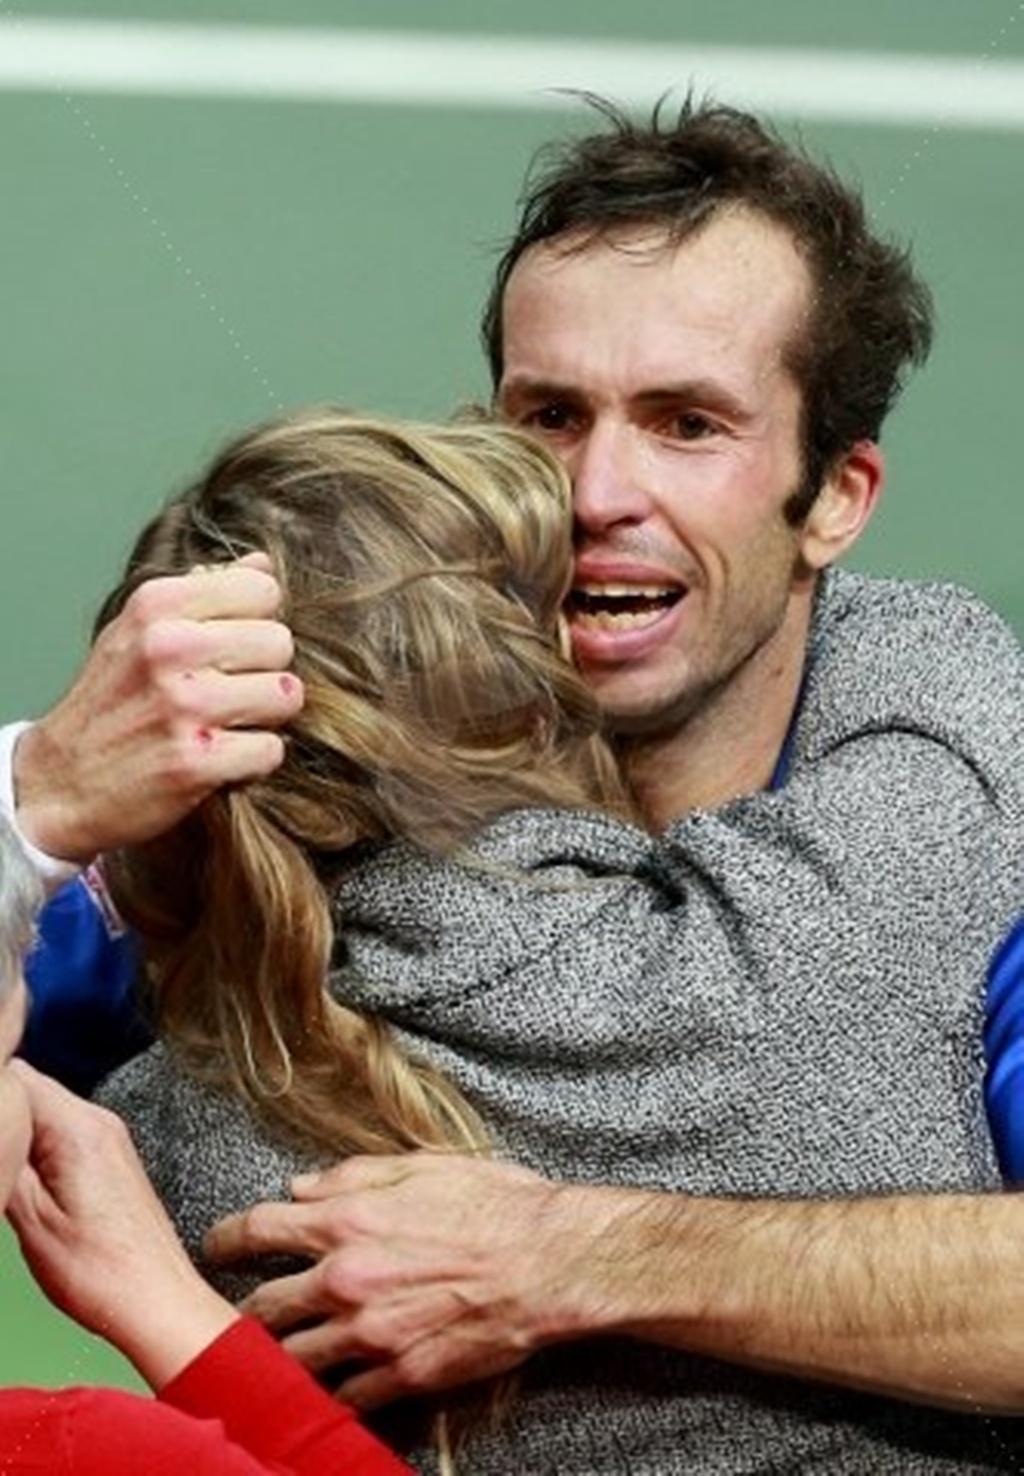 [Image: Crying-Radek-Stepanek-tennis-32911661-1024-1476.jpg]